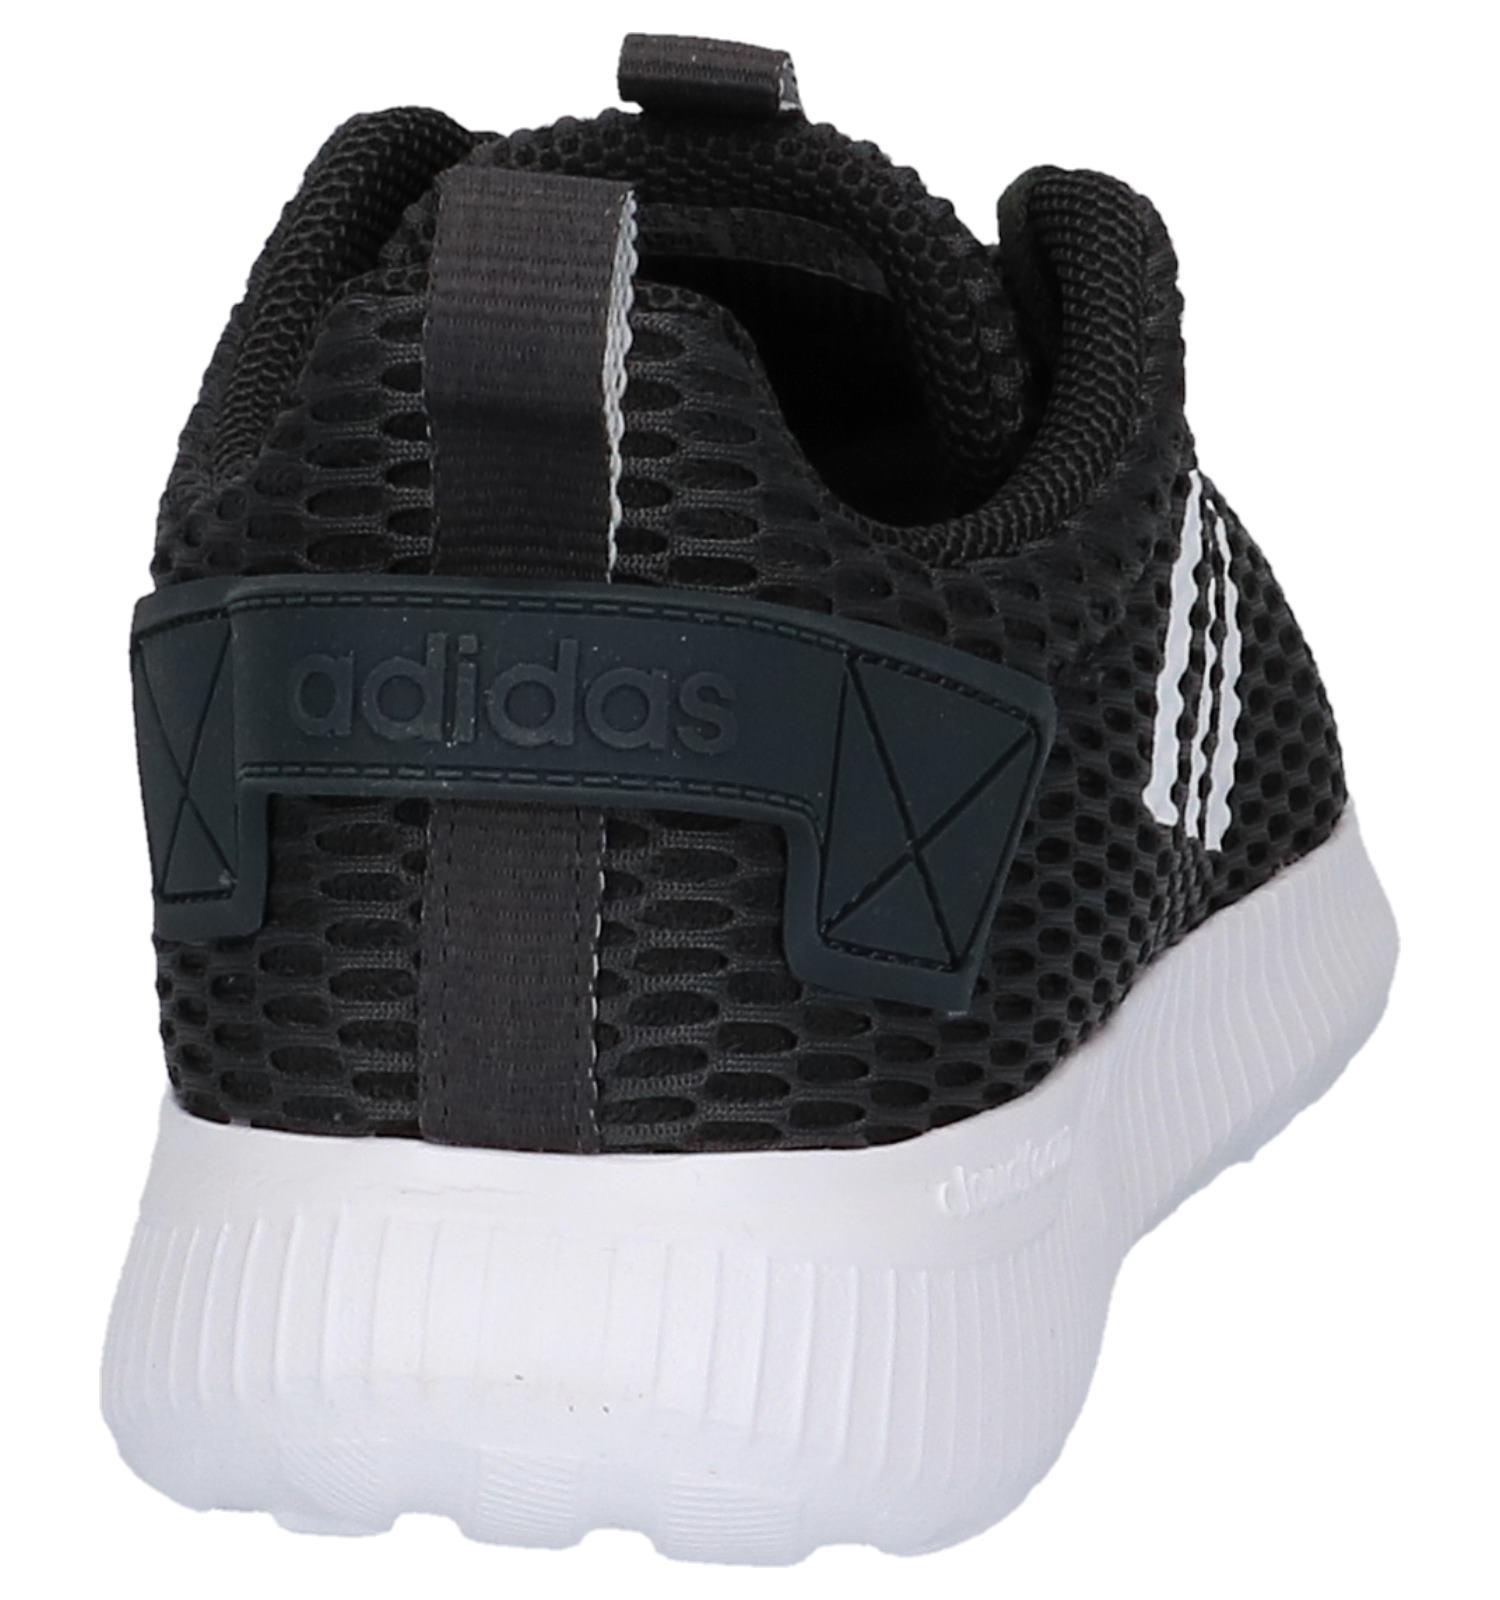 Sneakers Adidas Donkergrijze Racer Cf Cc Lite 8wvmnON0